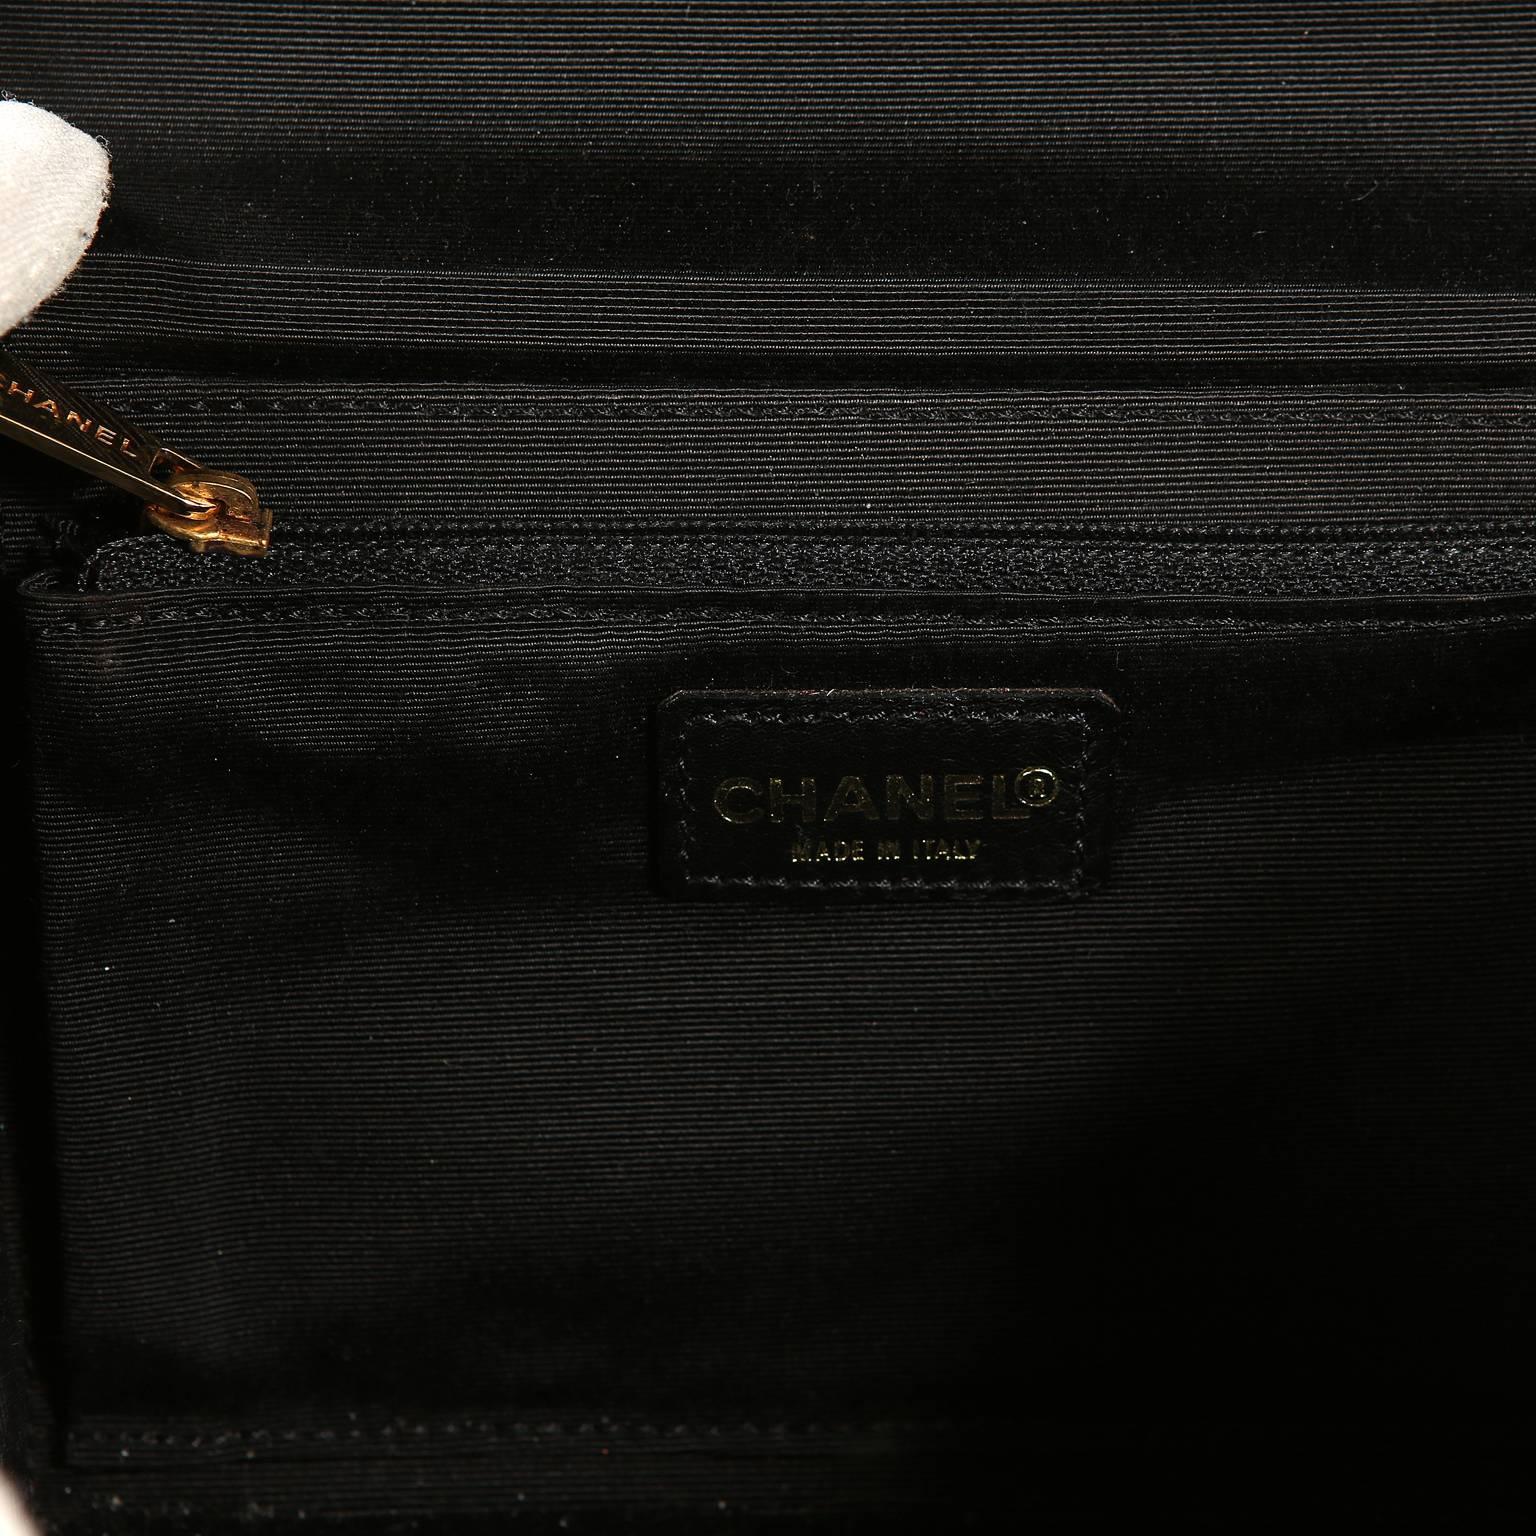 e21960375b3478 Chanel Black and Cream Bakelite Small Shoulder Bag at 1stdibs